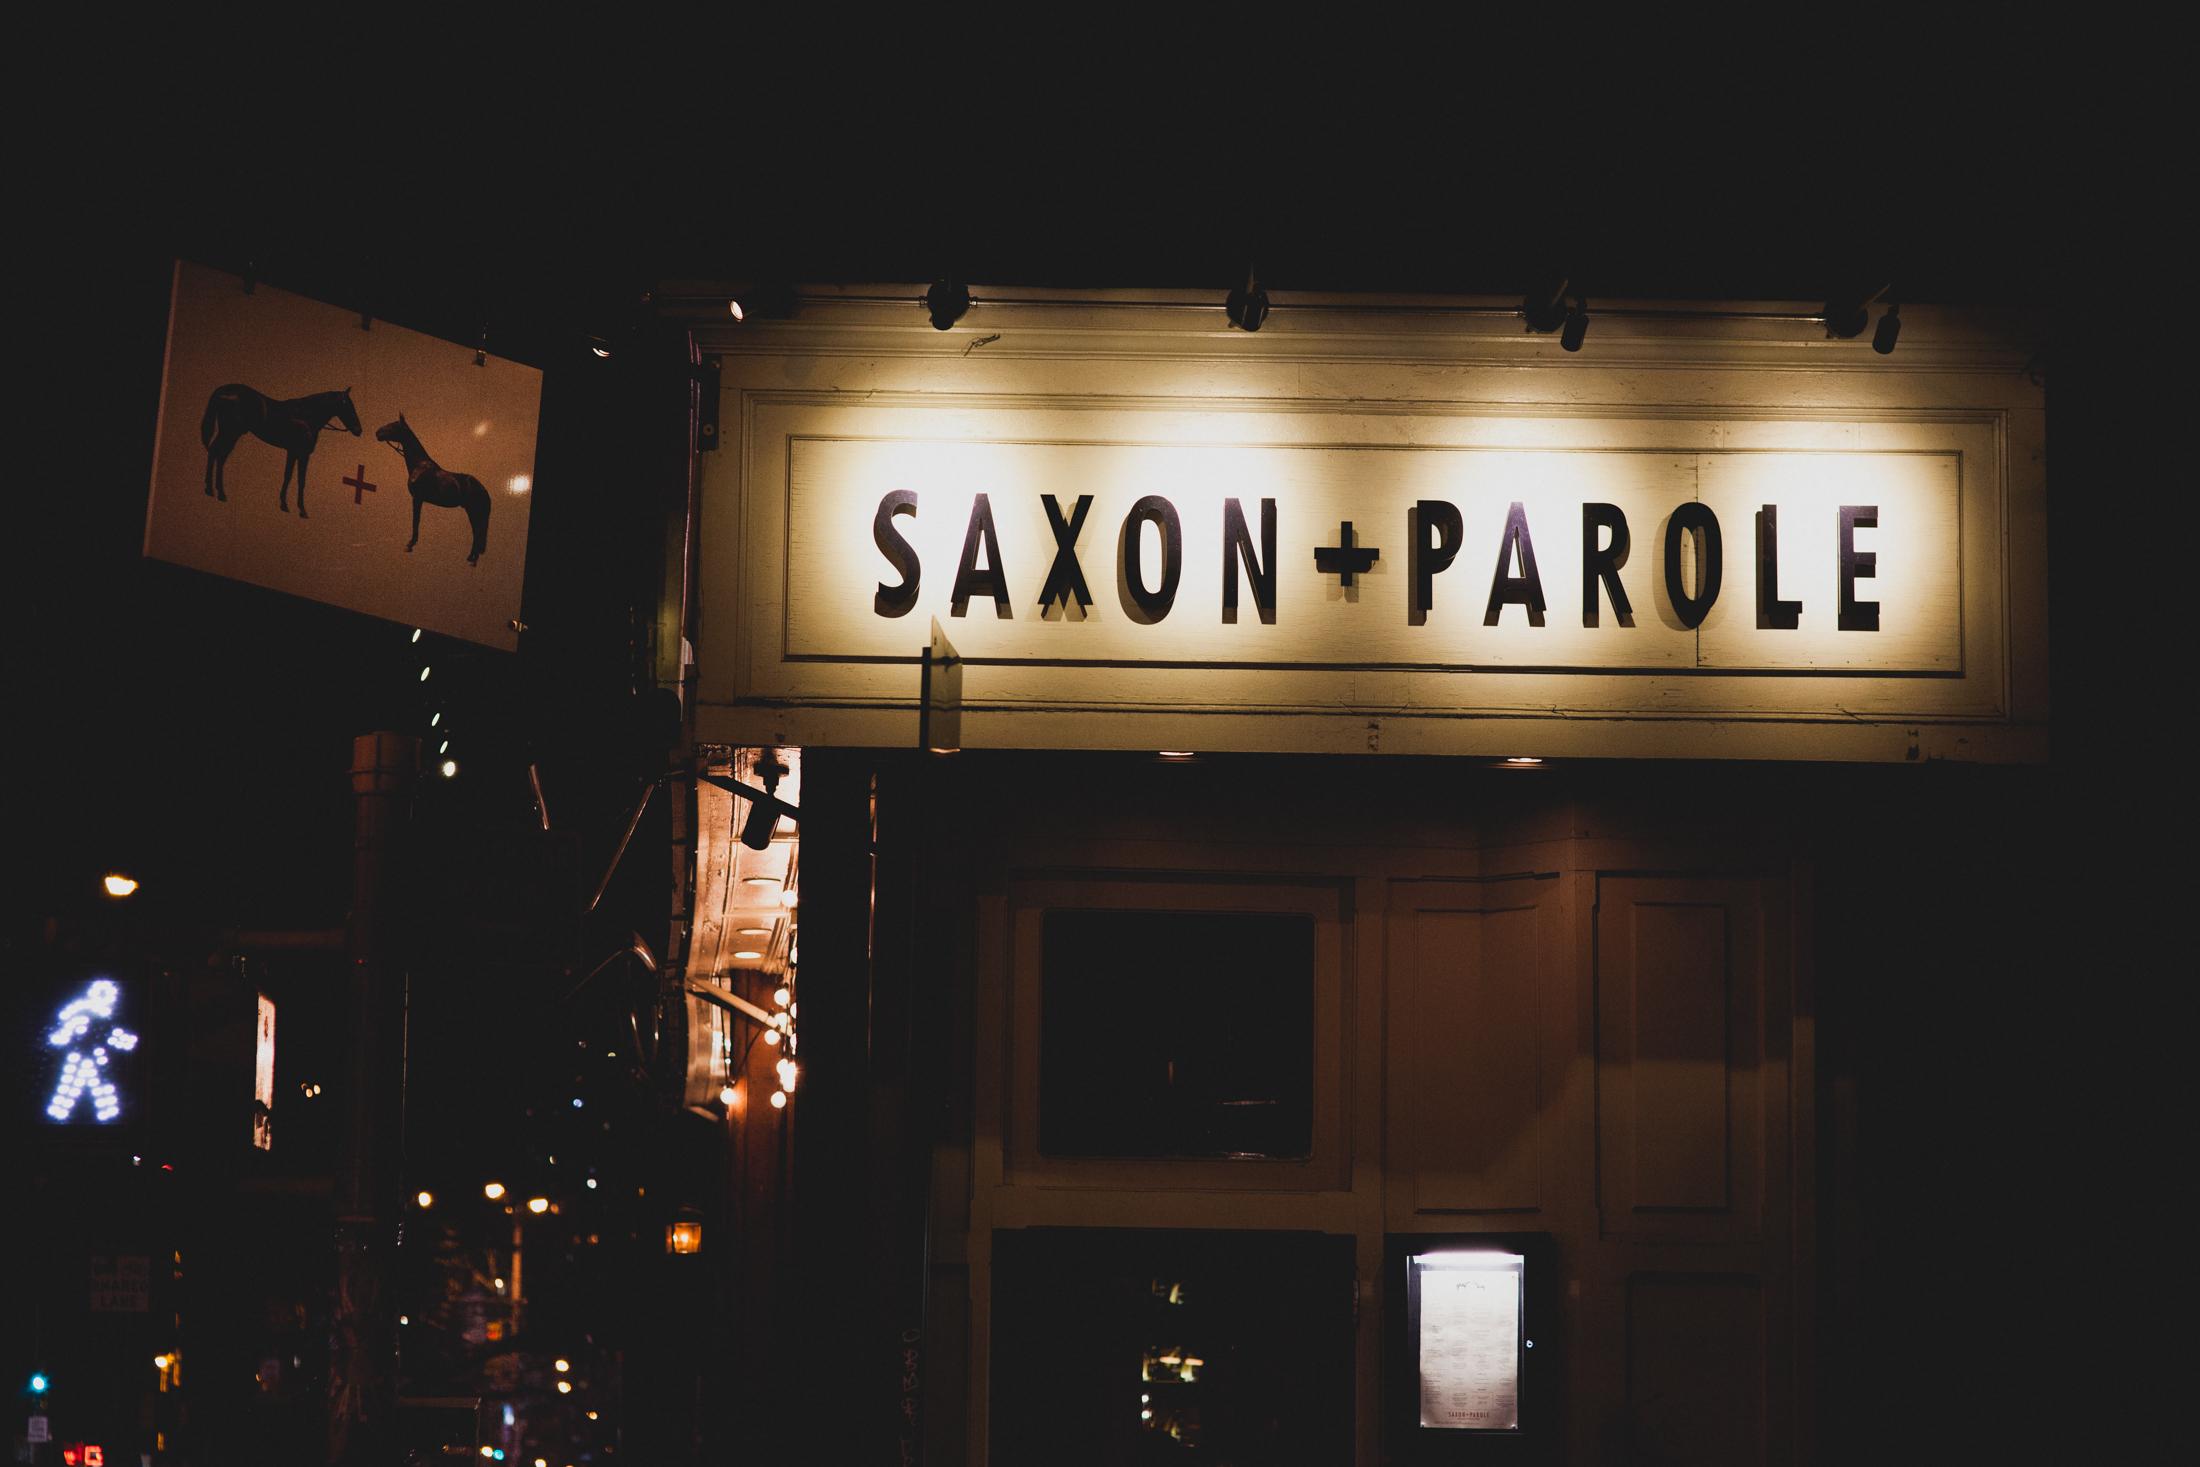 absolut_elyx-saxon+parole_ss-002.jpg